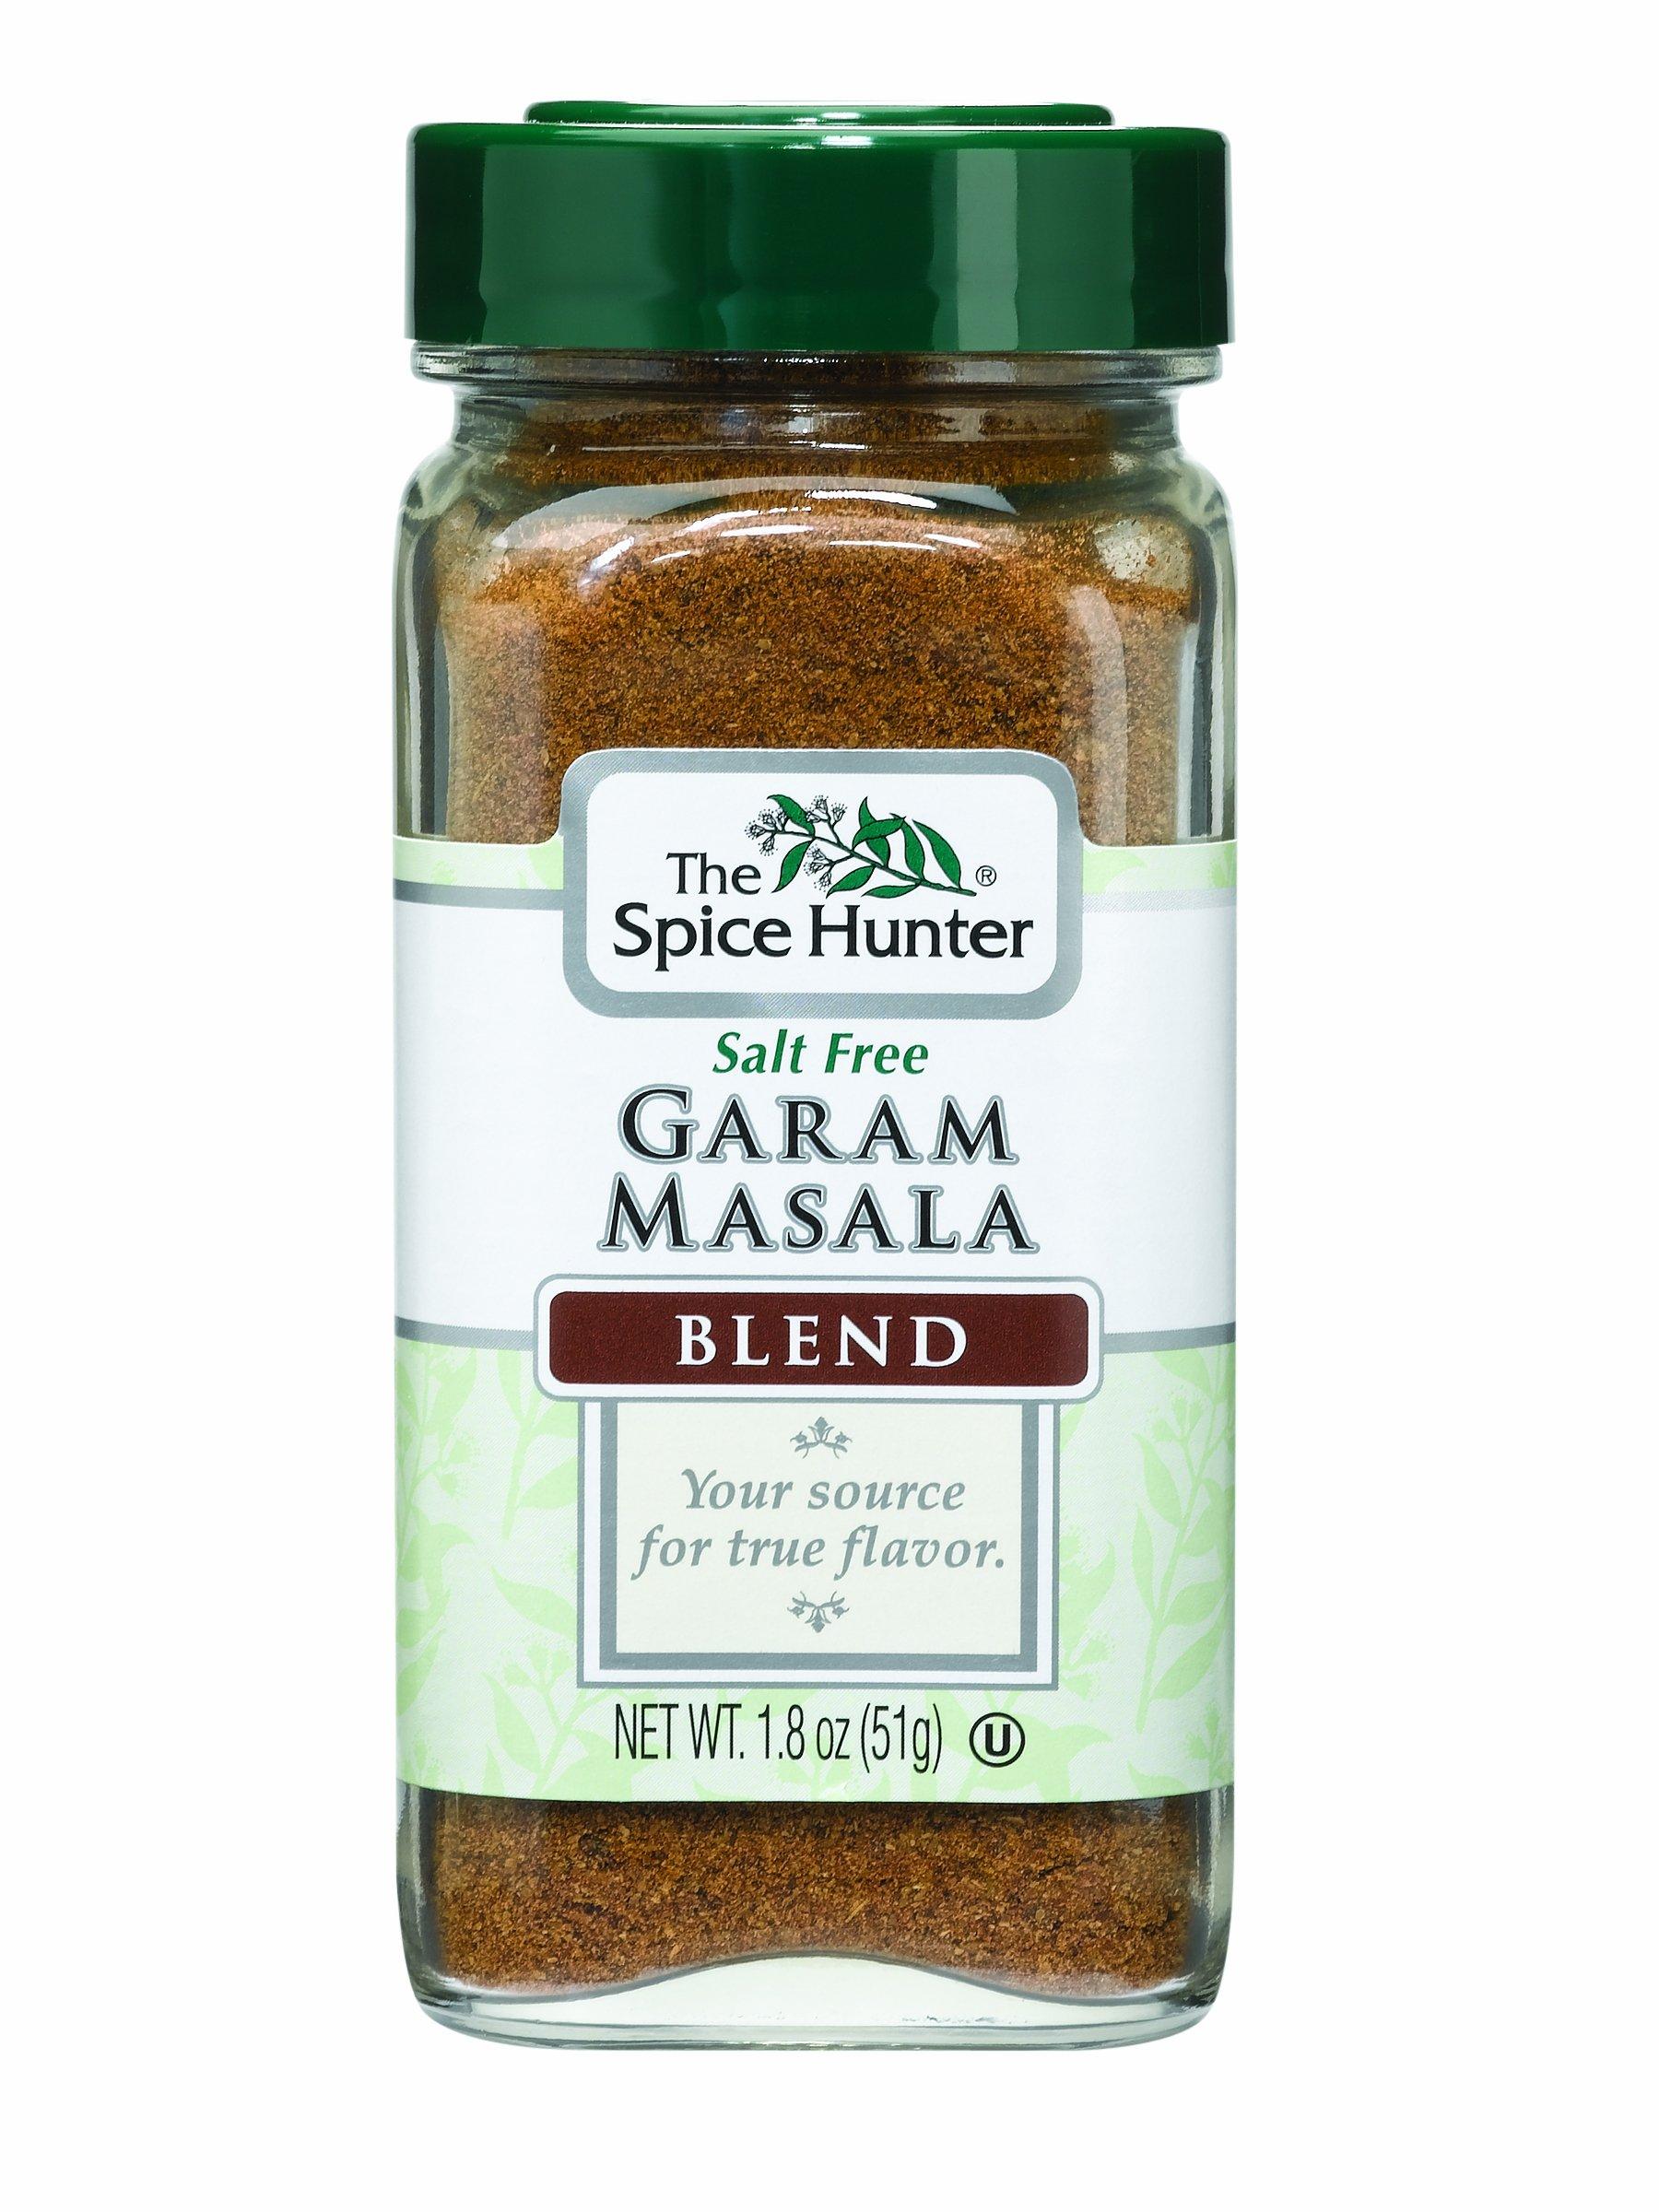 The Spice Hunter Garam Masala Blend, 1.8-Ounce Jars (Pack of 6)